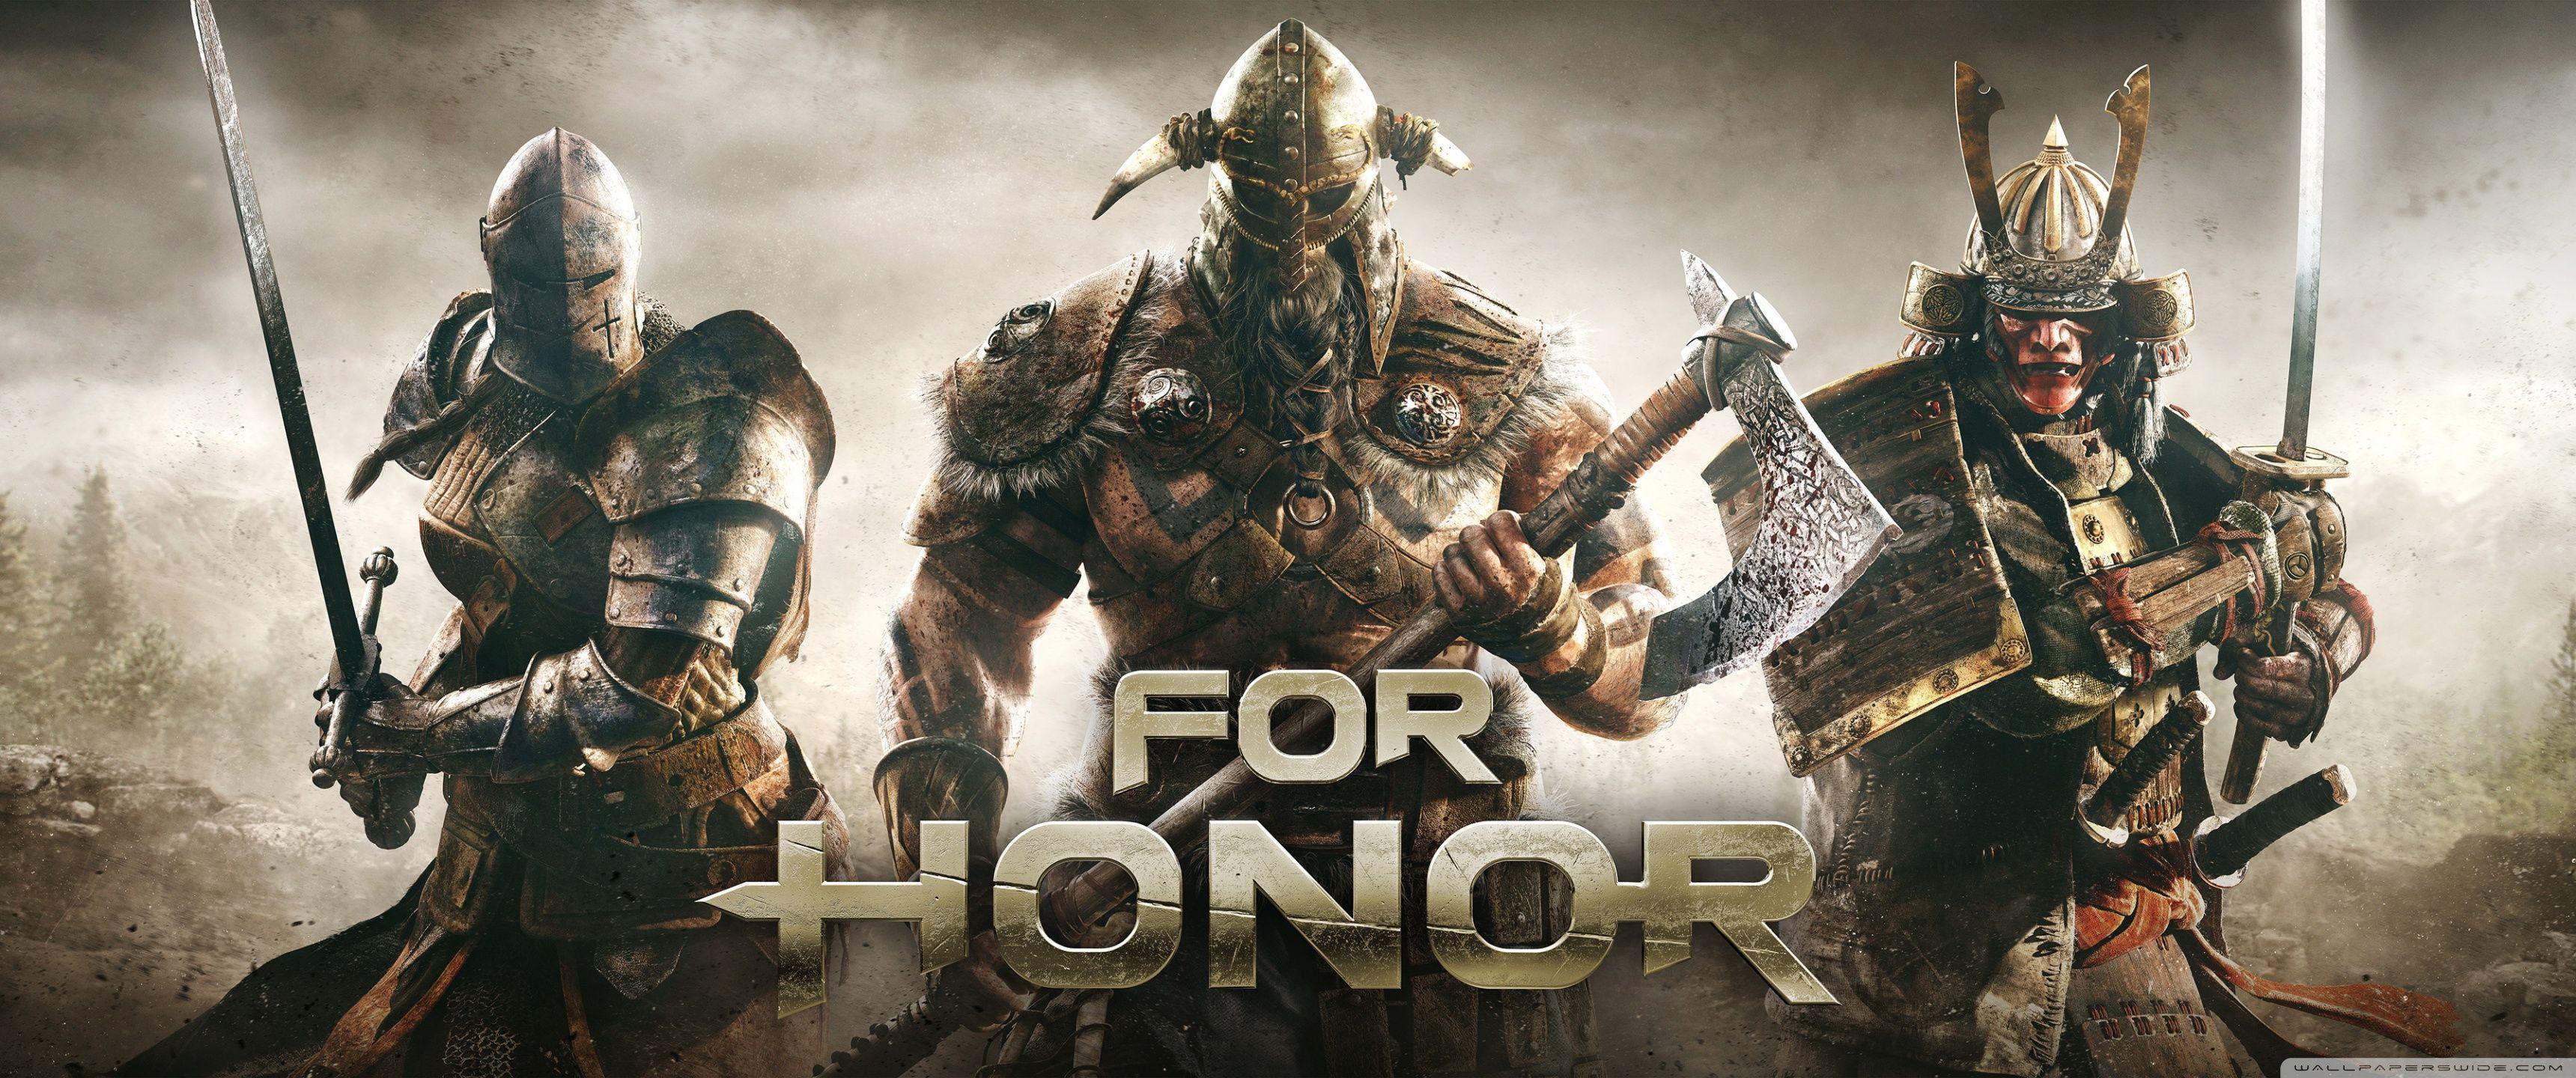 For Honor Viking Wallpaper: For Honor Samurai Wallpapers